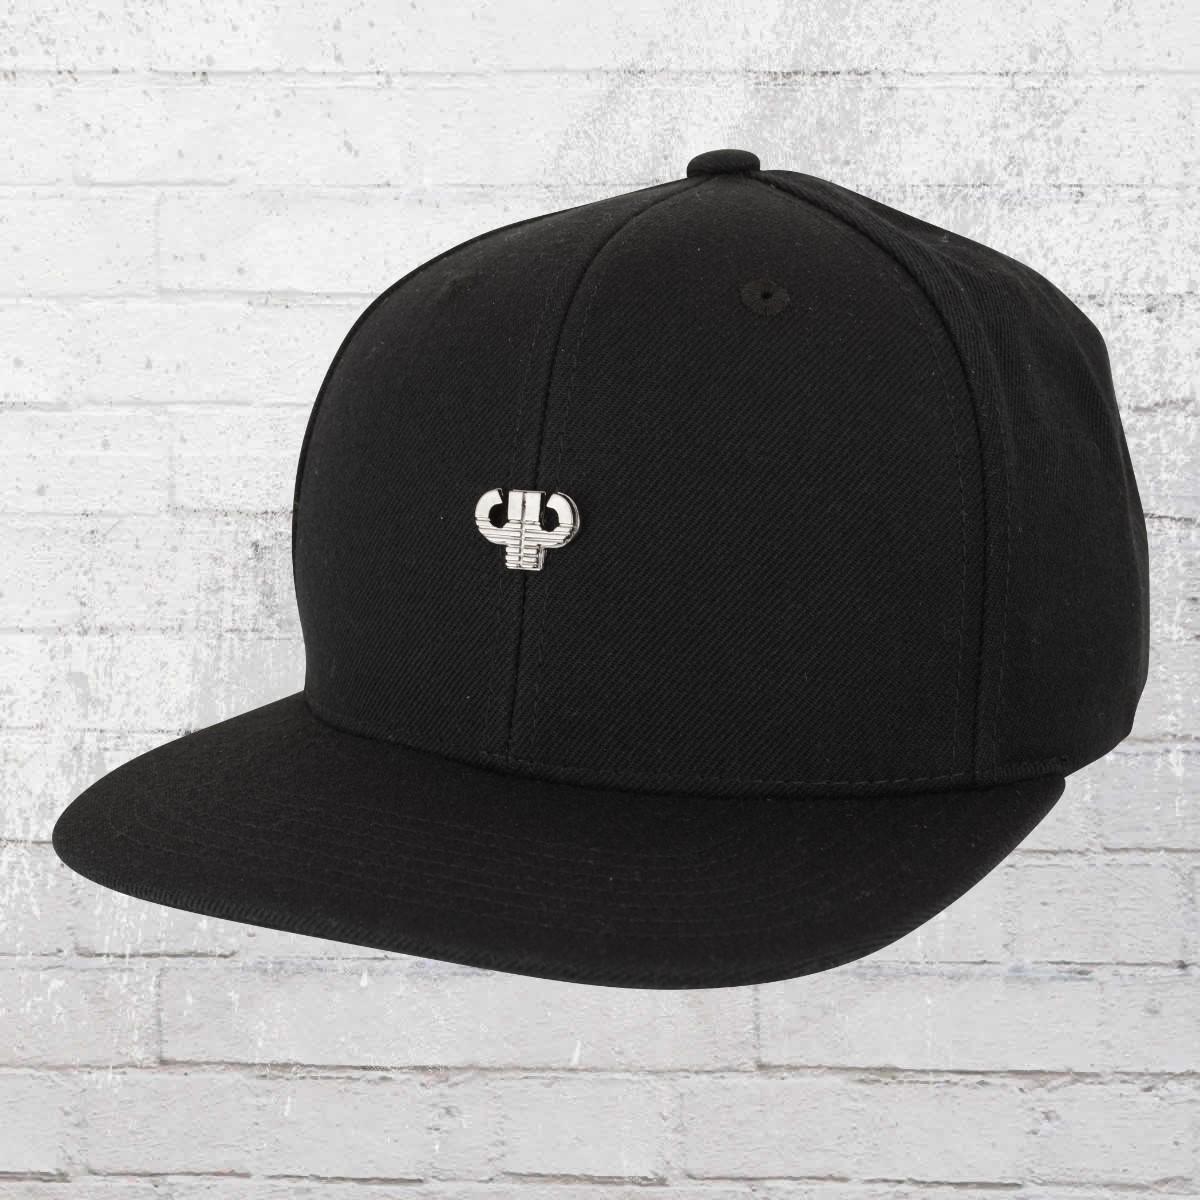 7219f9638c0 Order now pelle hat icon plate snapback cap black jpg 1200x1200 Pelle black  hats